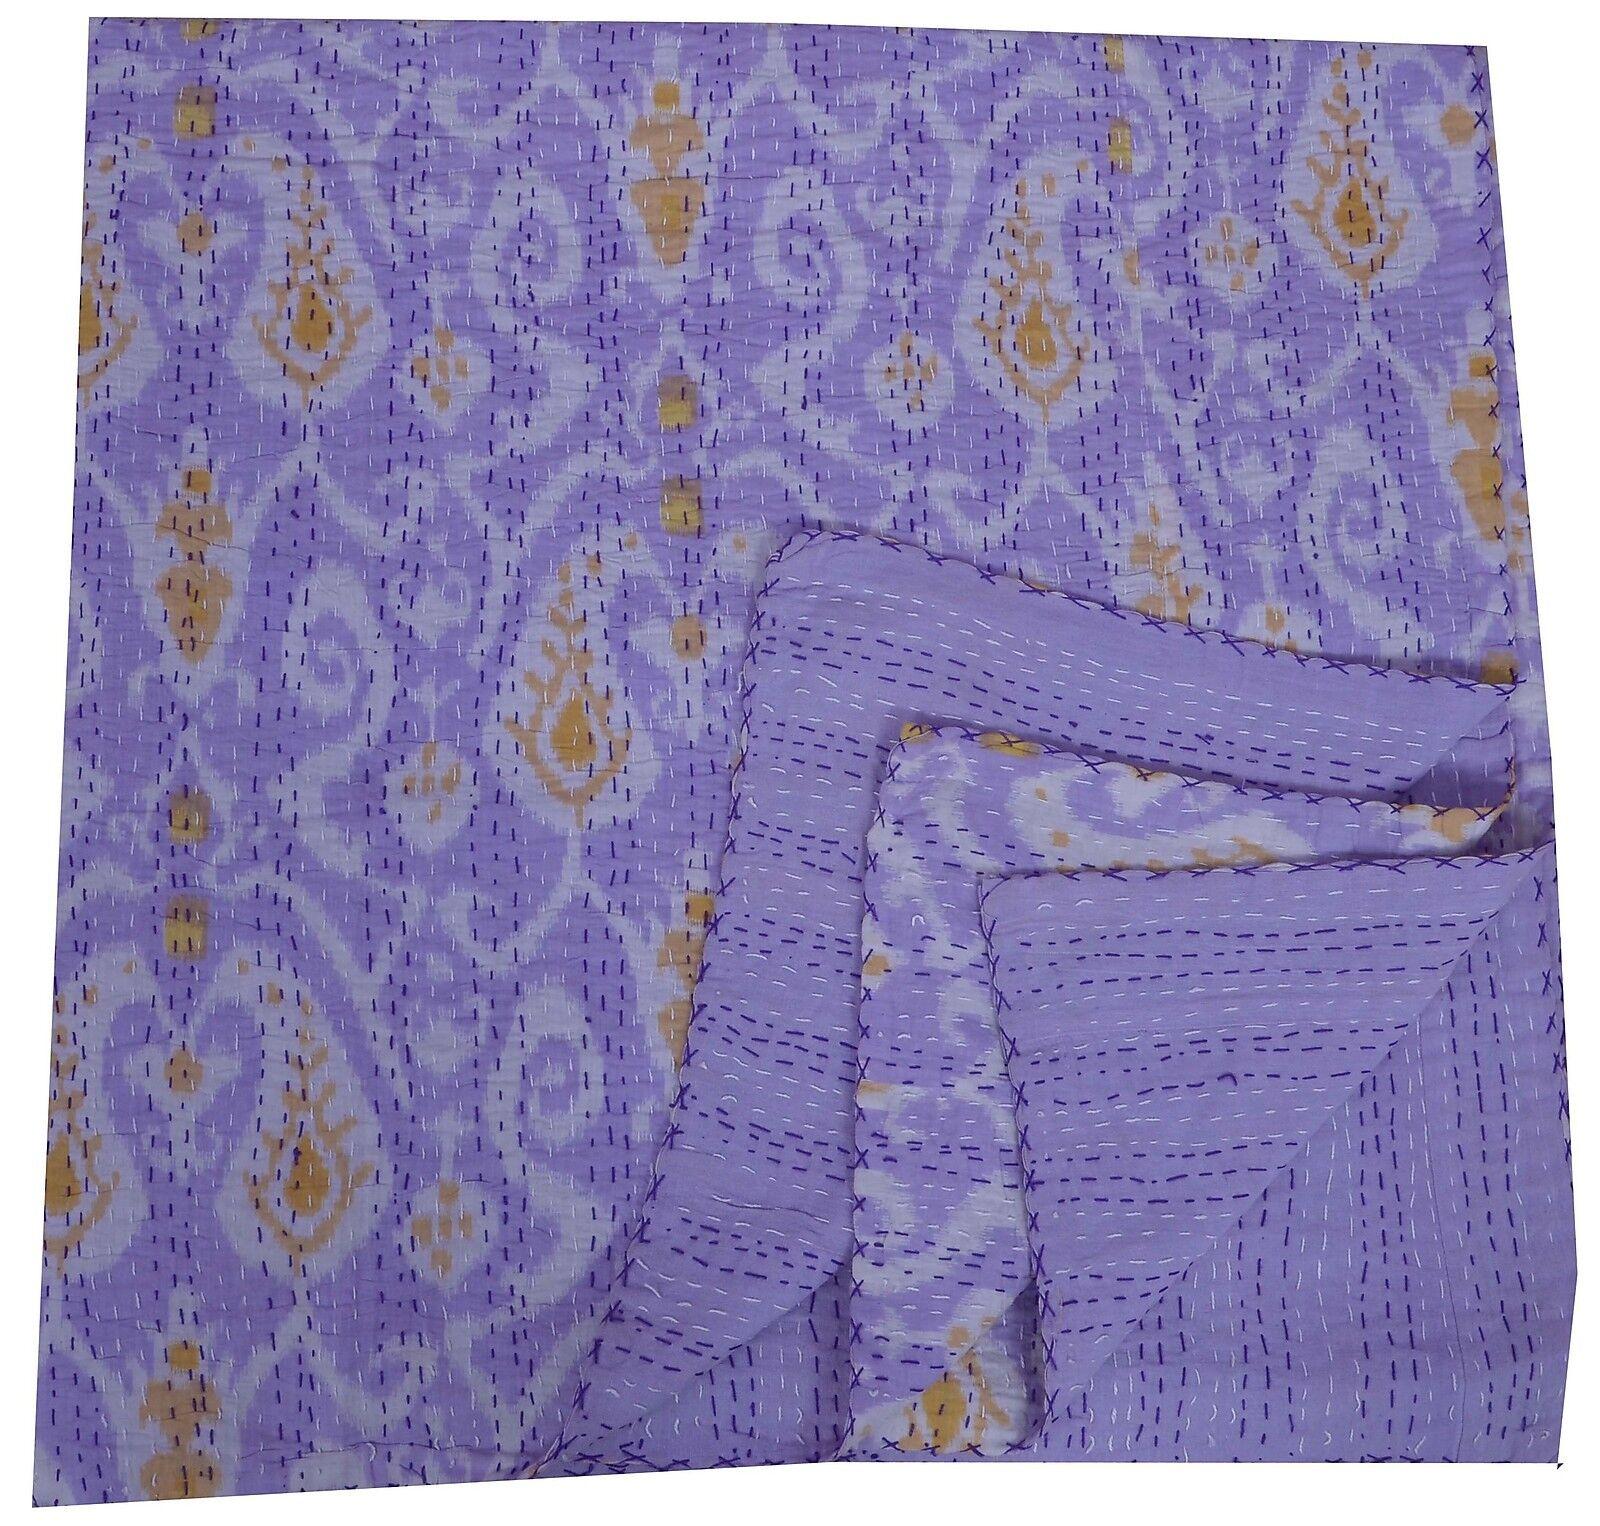 Indian Ikat Paisley Kantha Quilt Königin Cotton Throw lila Bettspread Blanket